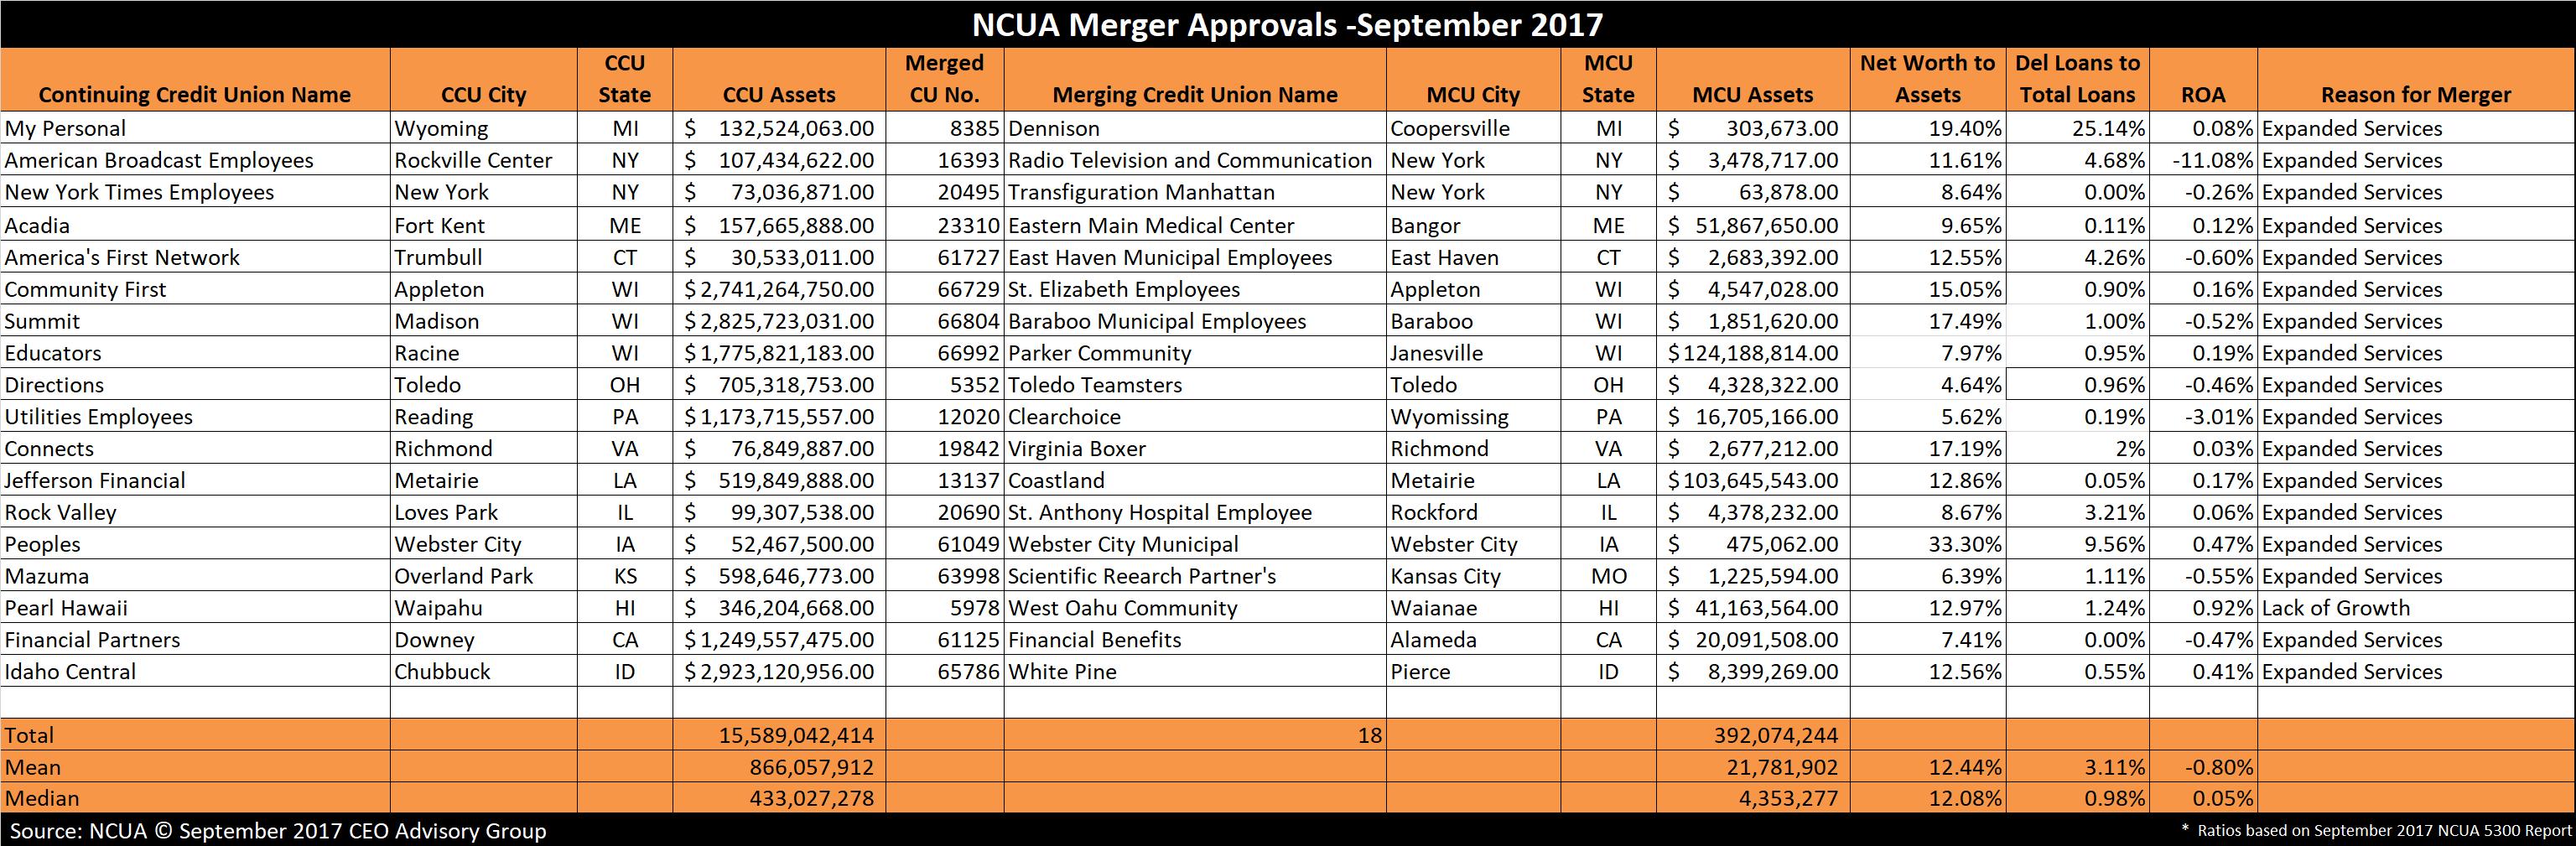 Credit Union Merger Approvals - September 2017